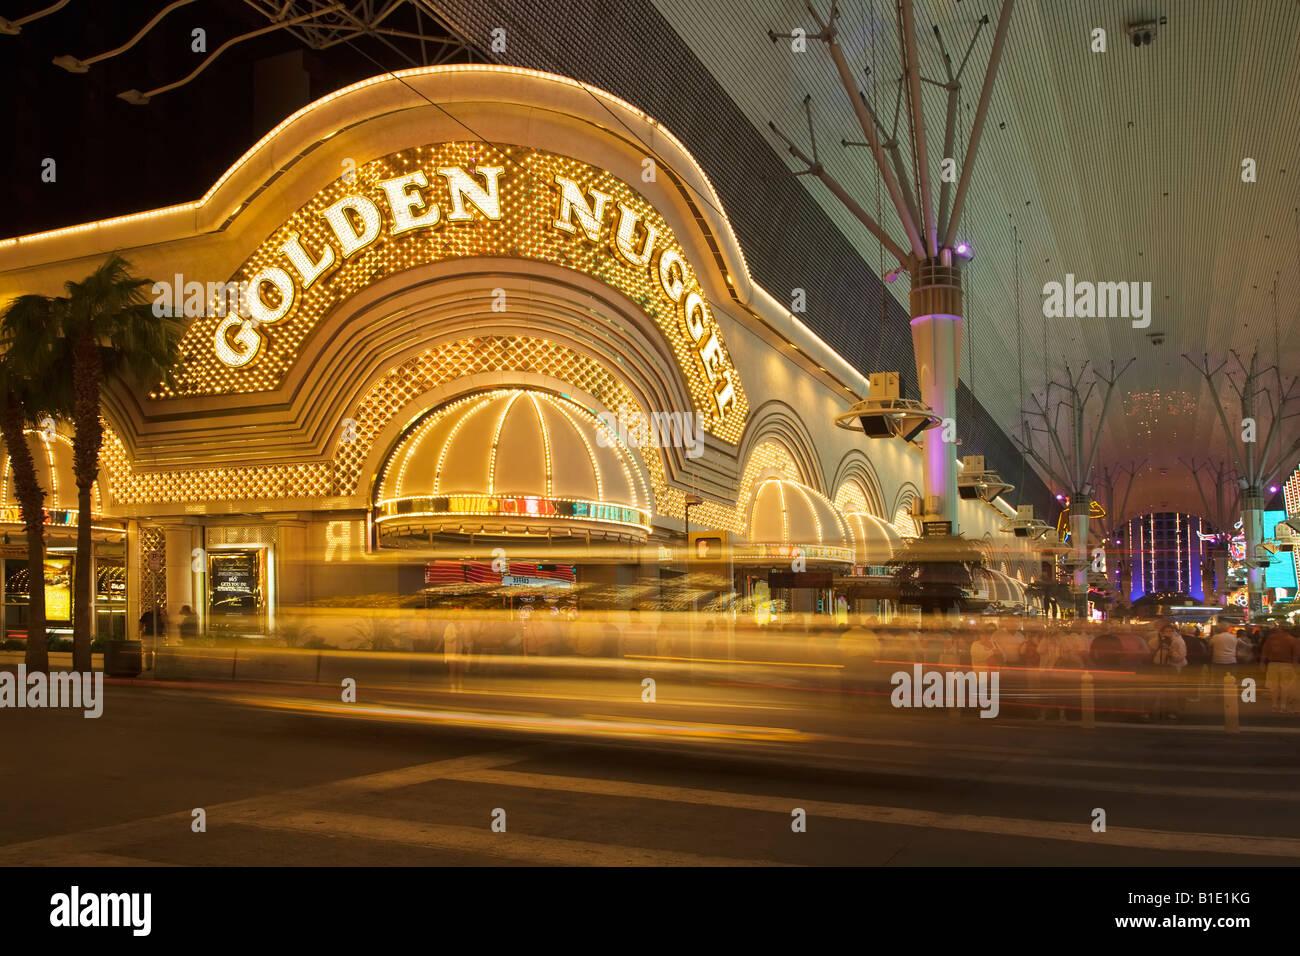 Golden nugget casino in london big six gambling wheel pawn stars